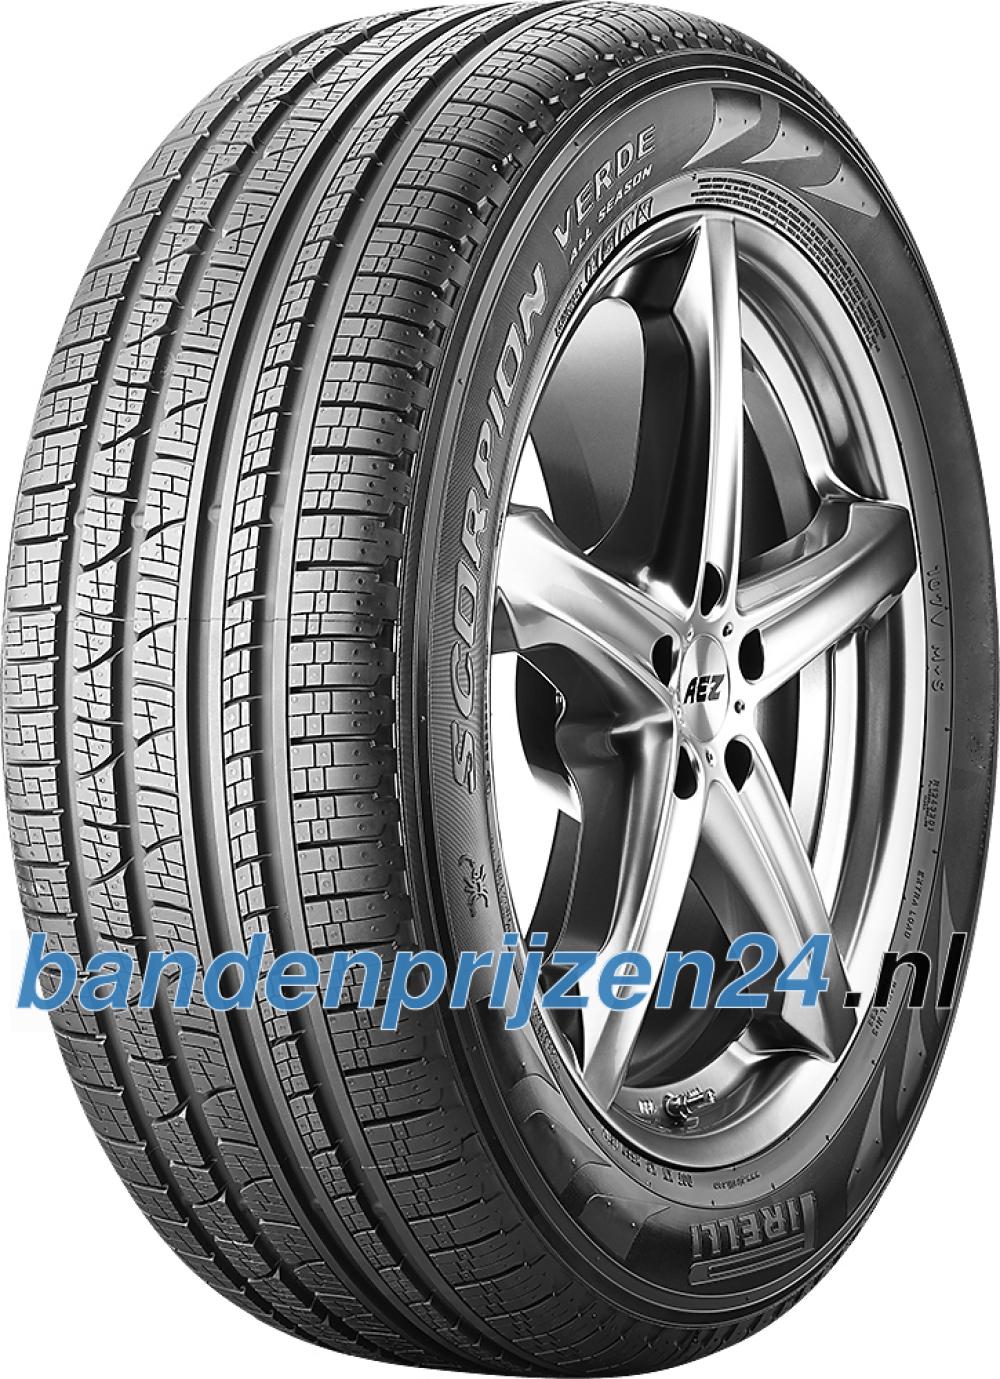 Pirelli Scorpion Verde All-Season RFT ( 285/45 R20 112H XL AOE, met velgrandbescherming (MFS), runflat )